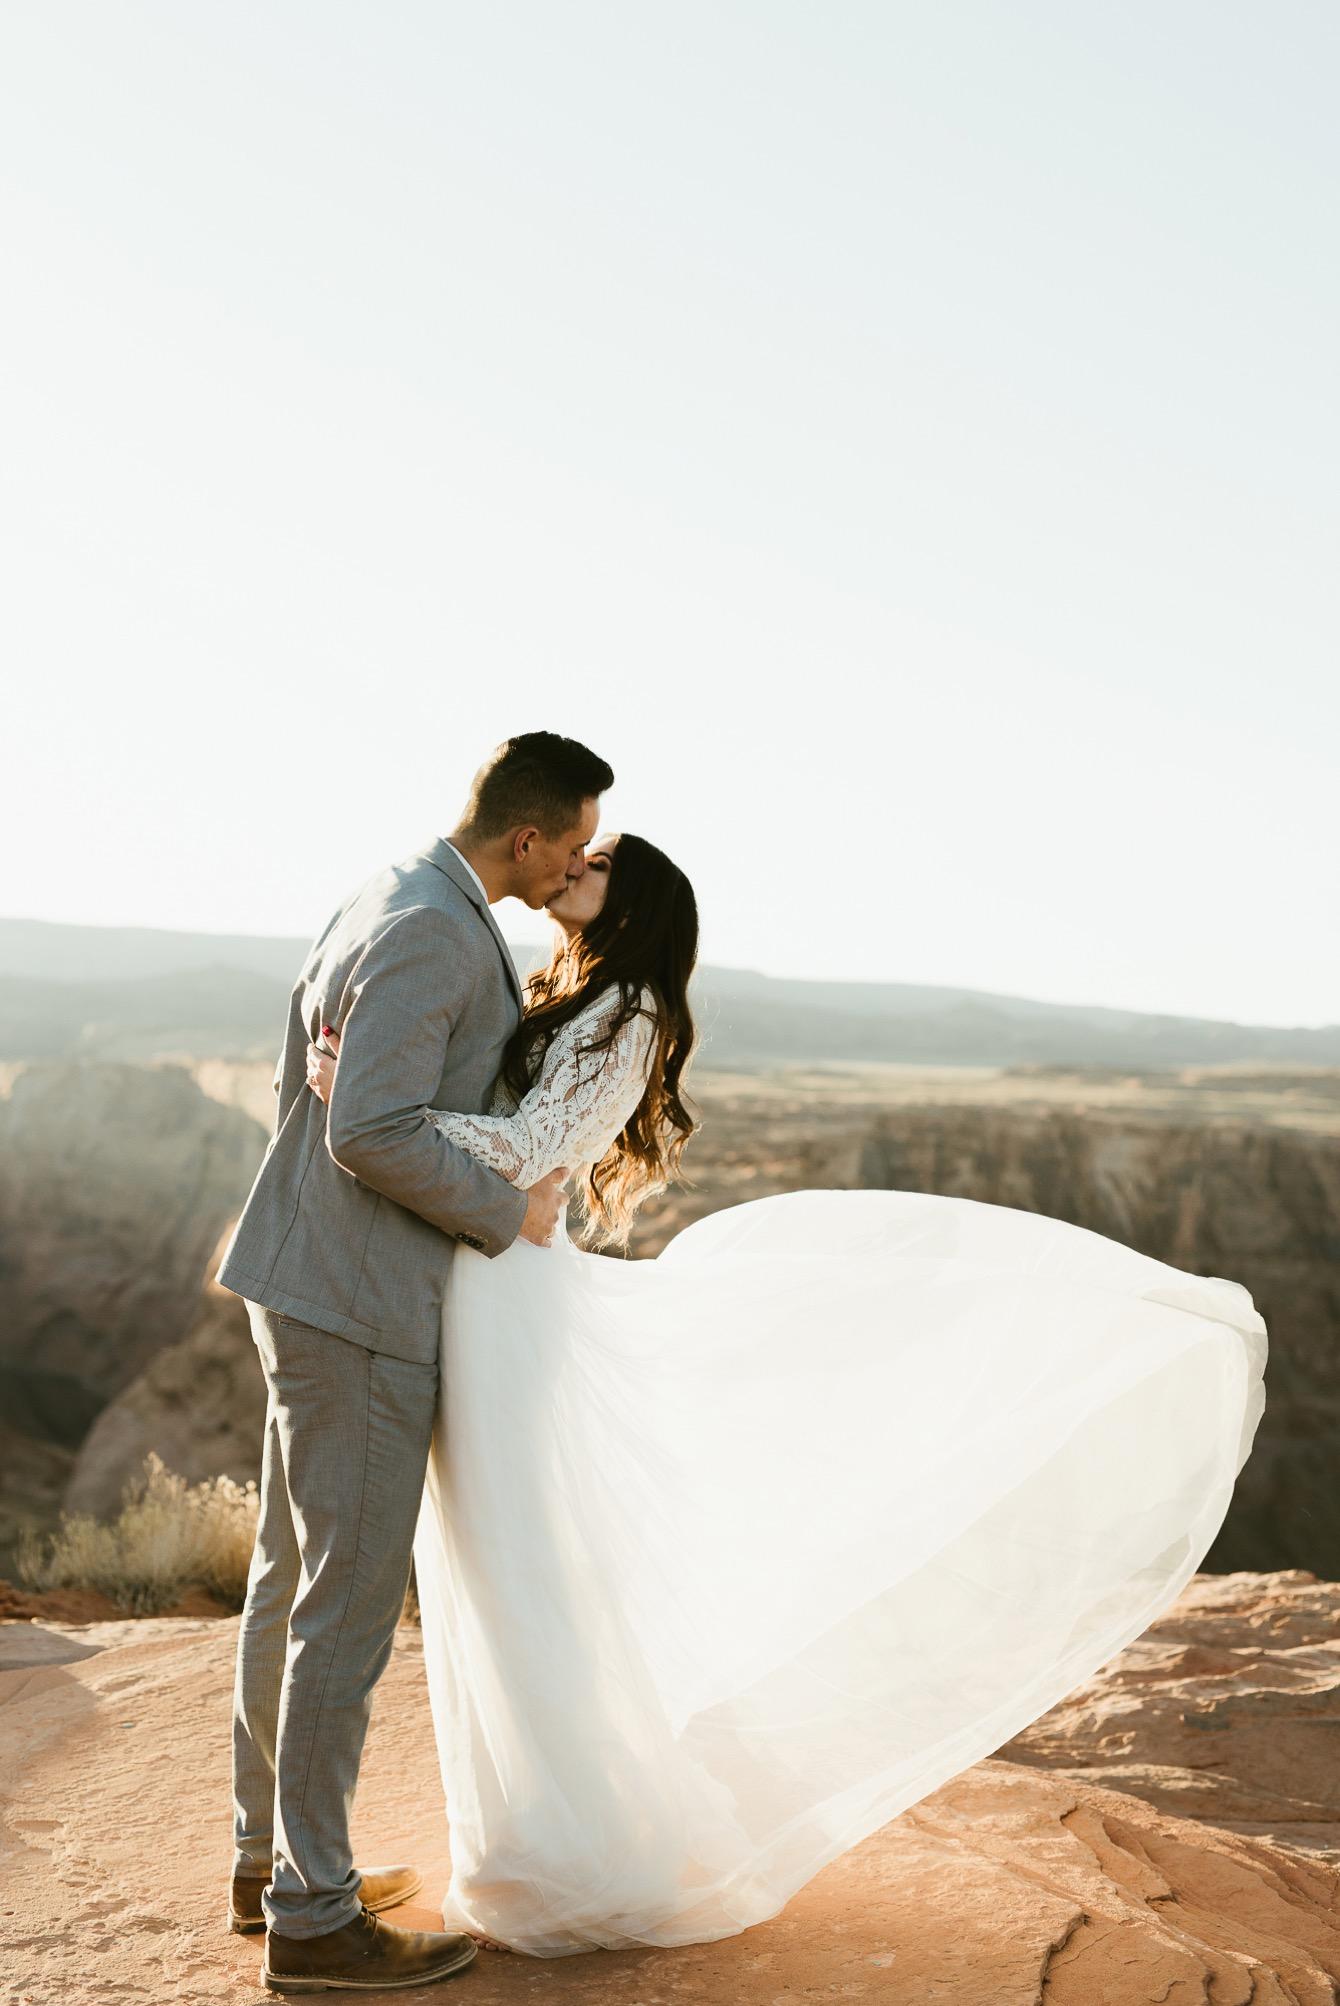 Couple in Arizona